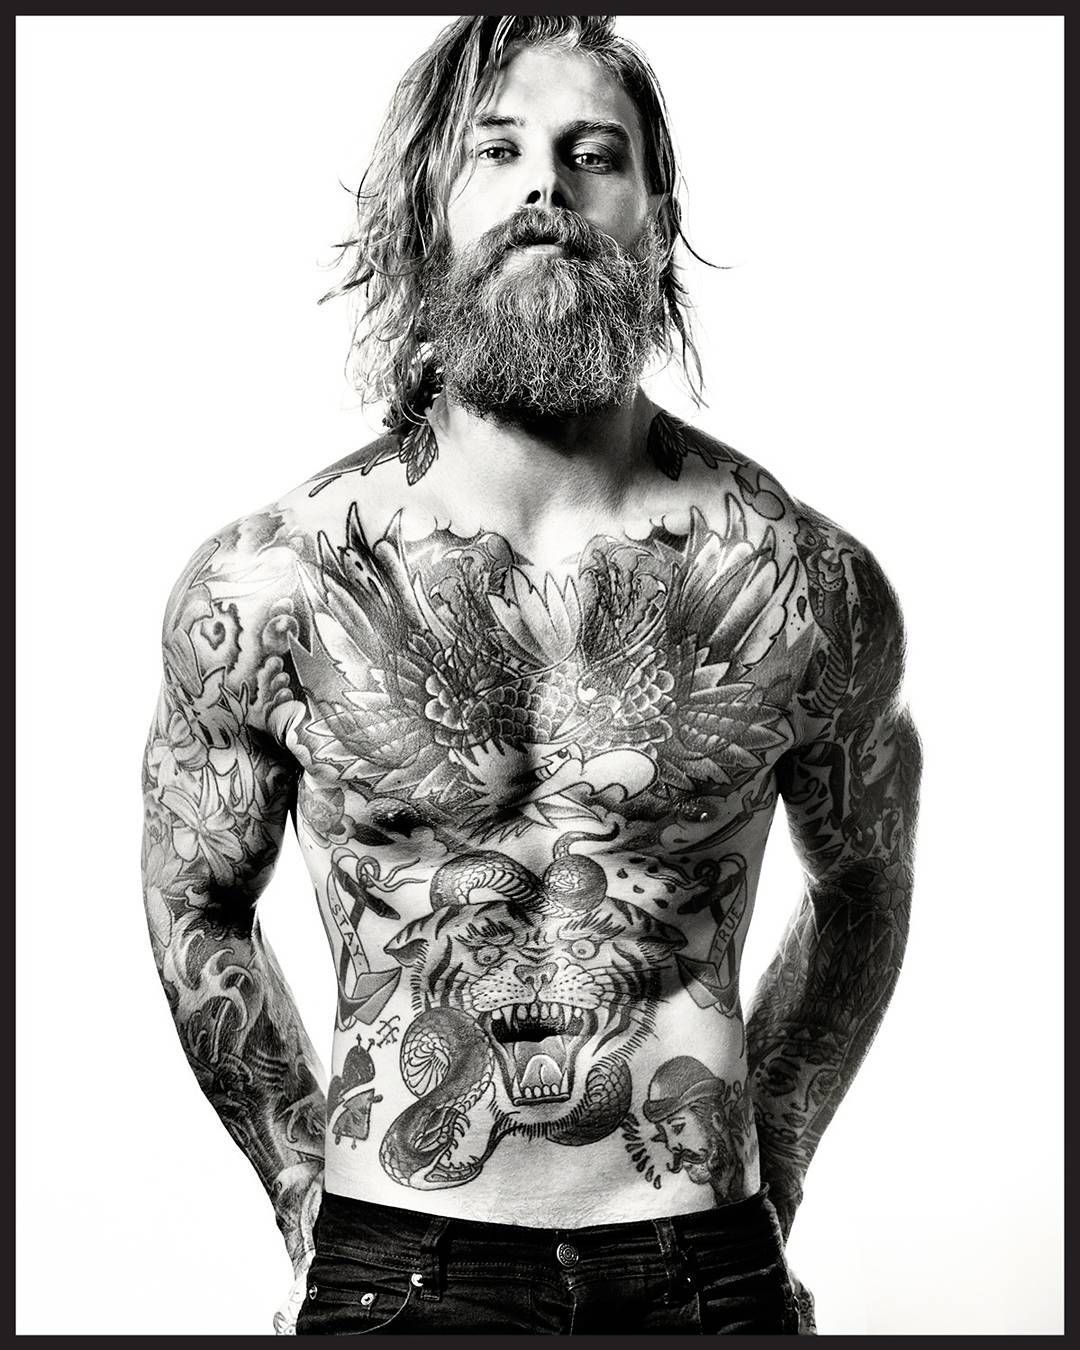 Tatuajes Guapos Para Hombres https://www.instagram/p/bpfrwqxgxt0/ | testosterone n tattoos